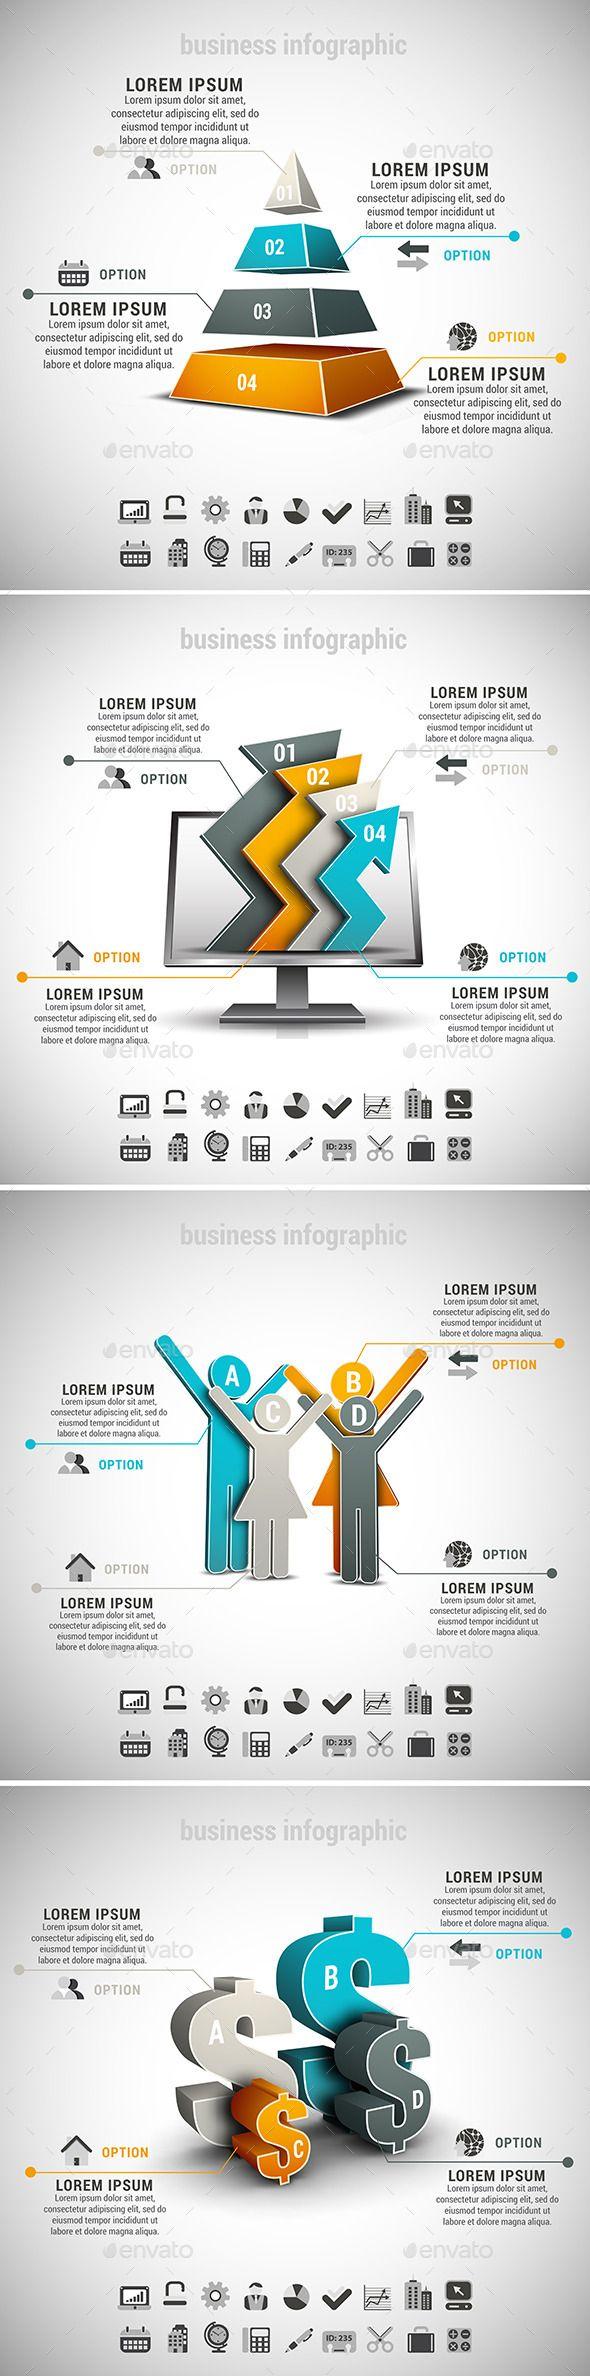 4 in 1 Business Infographics Bundle Templates #design Download: http://graphicriver.net/item/4-in-1-business-infographics-bundle/10701137?ref=ksioks